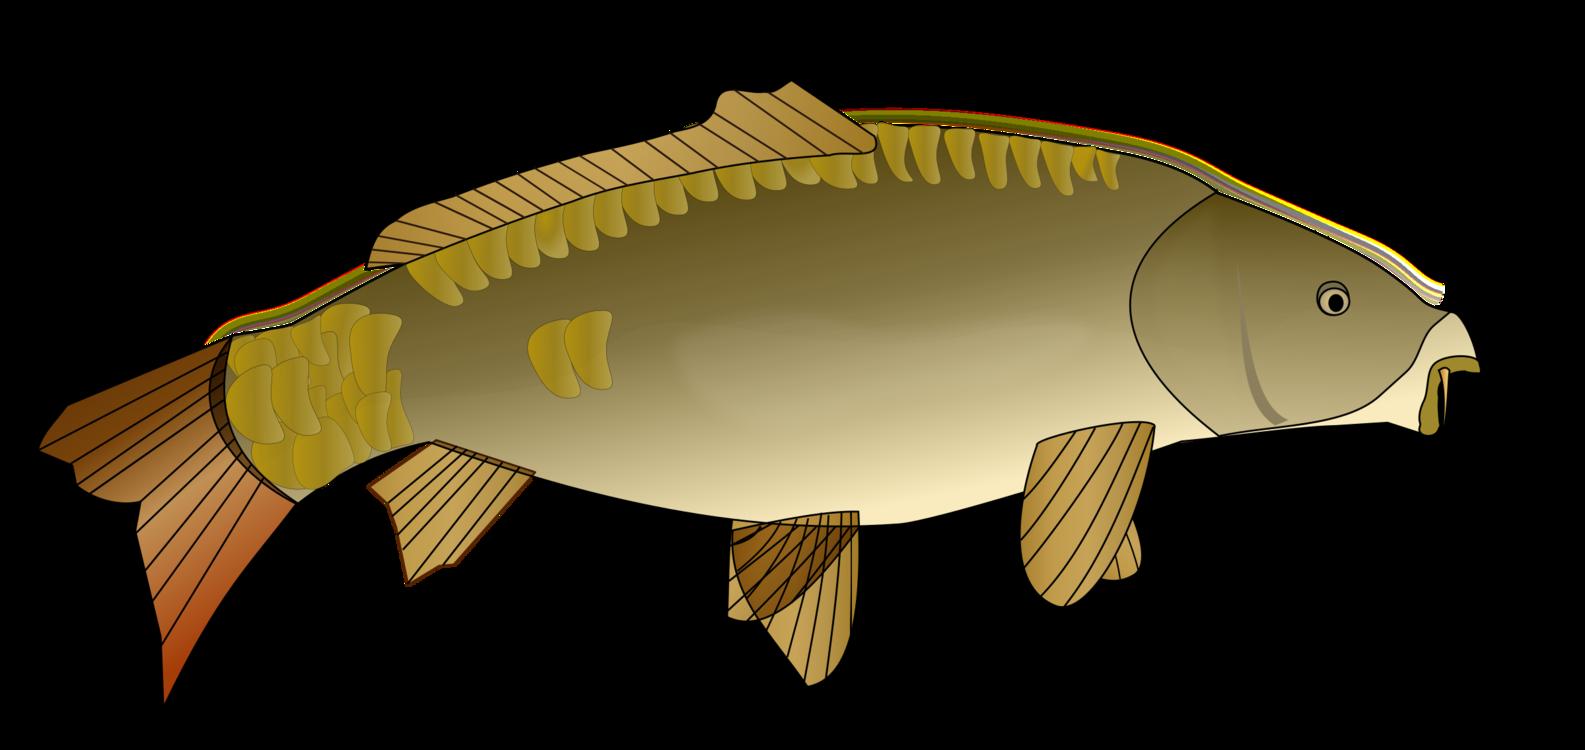 Perch,Bony Fish,Carp